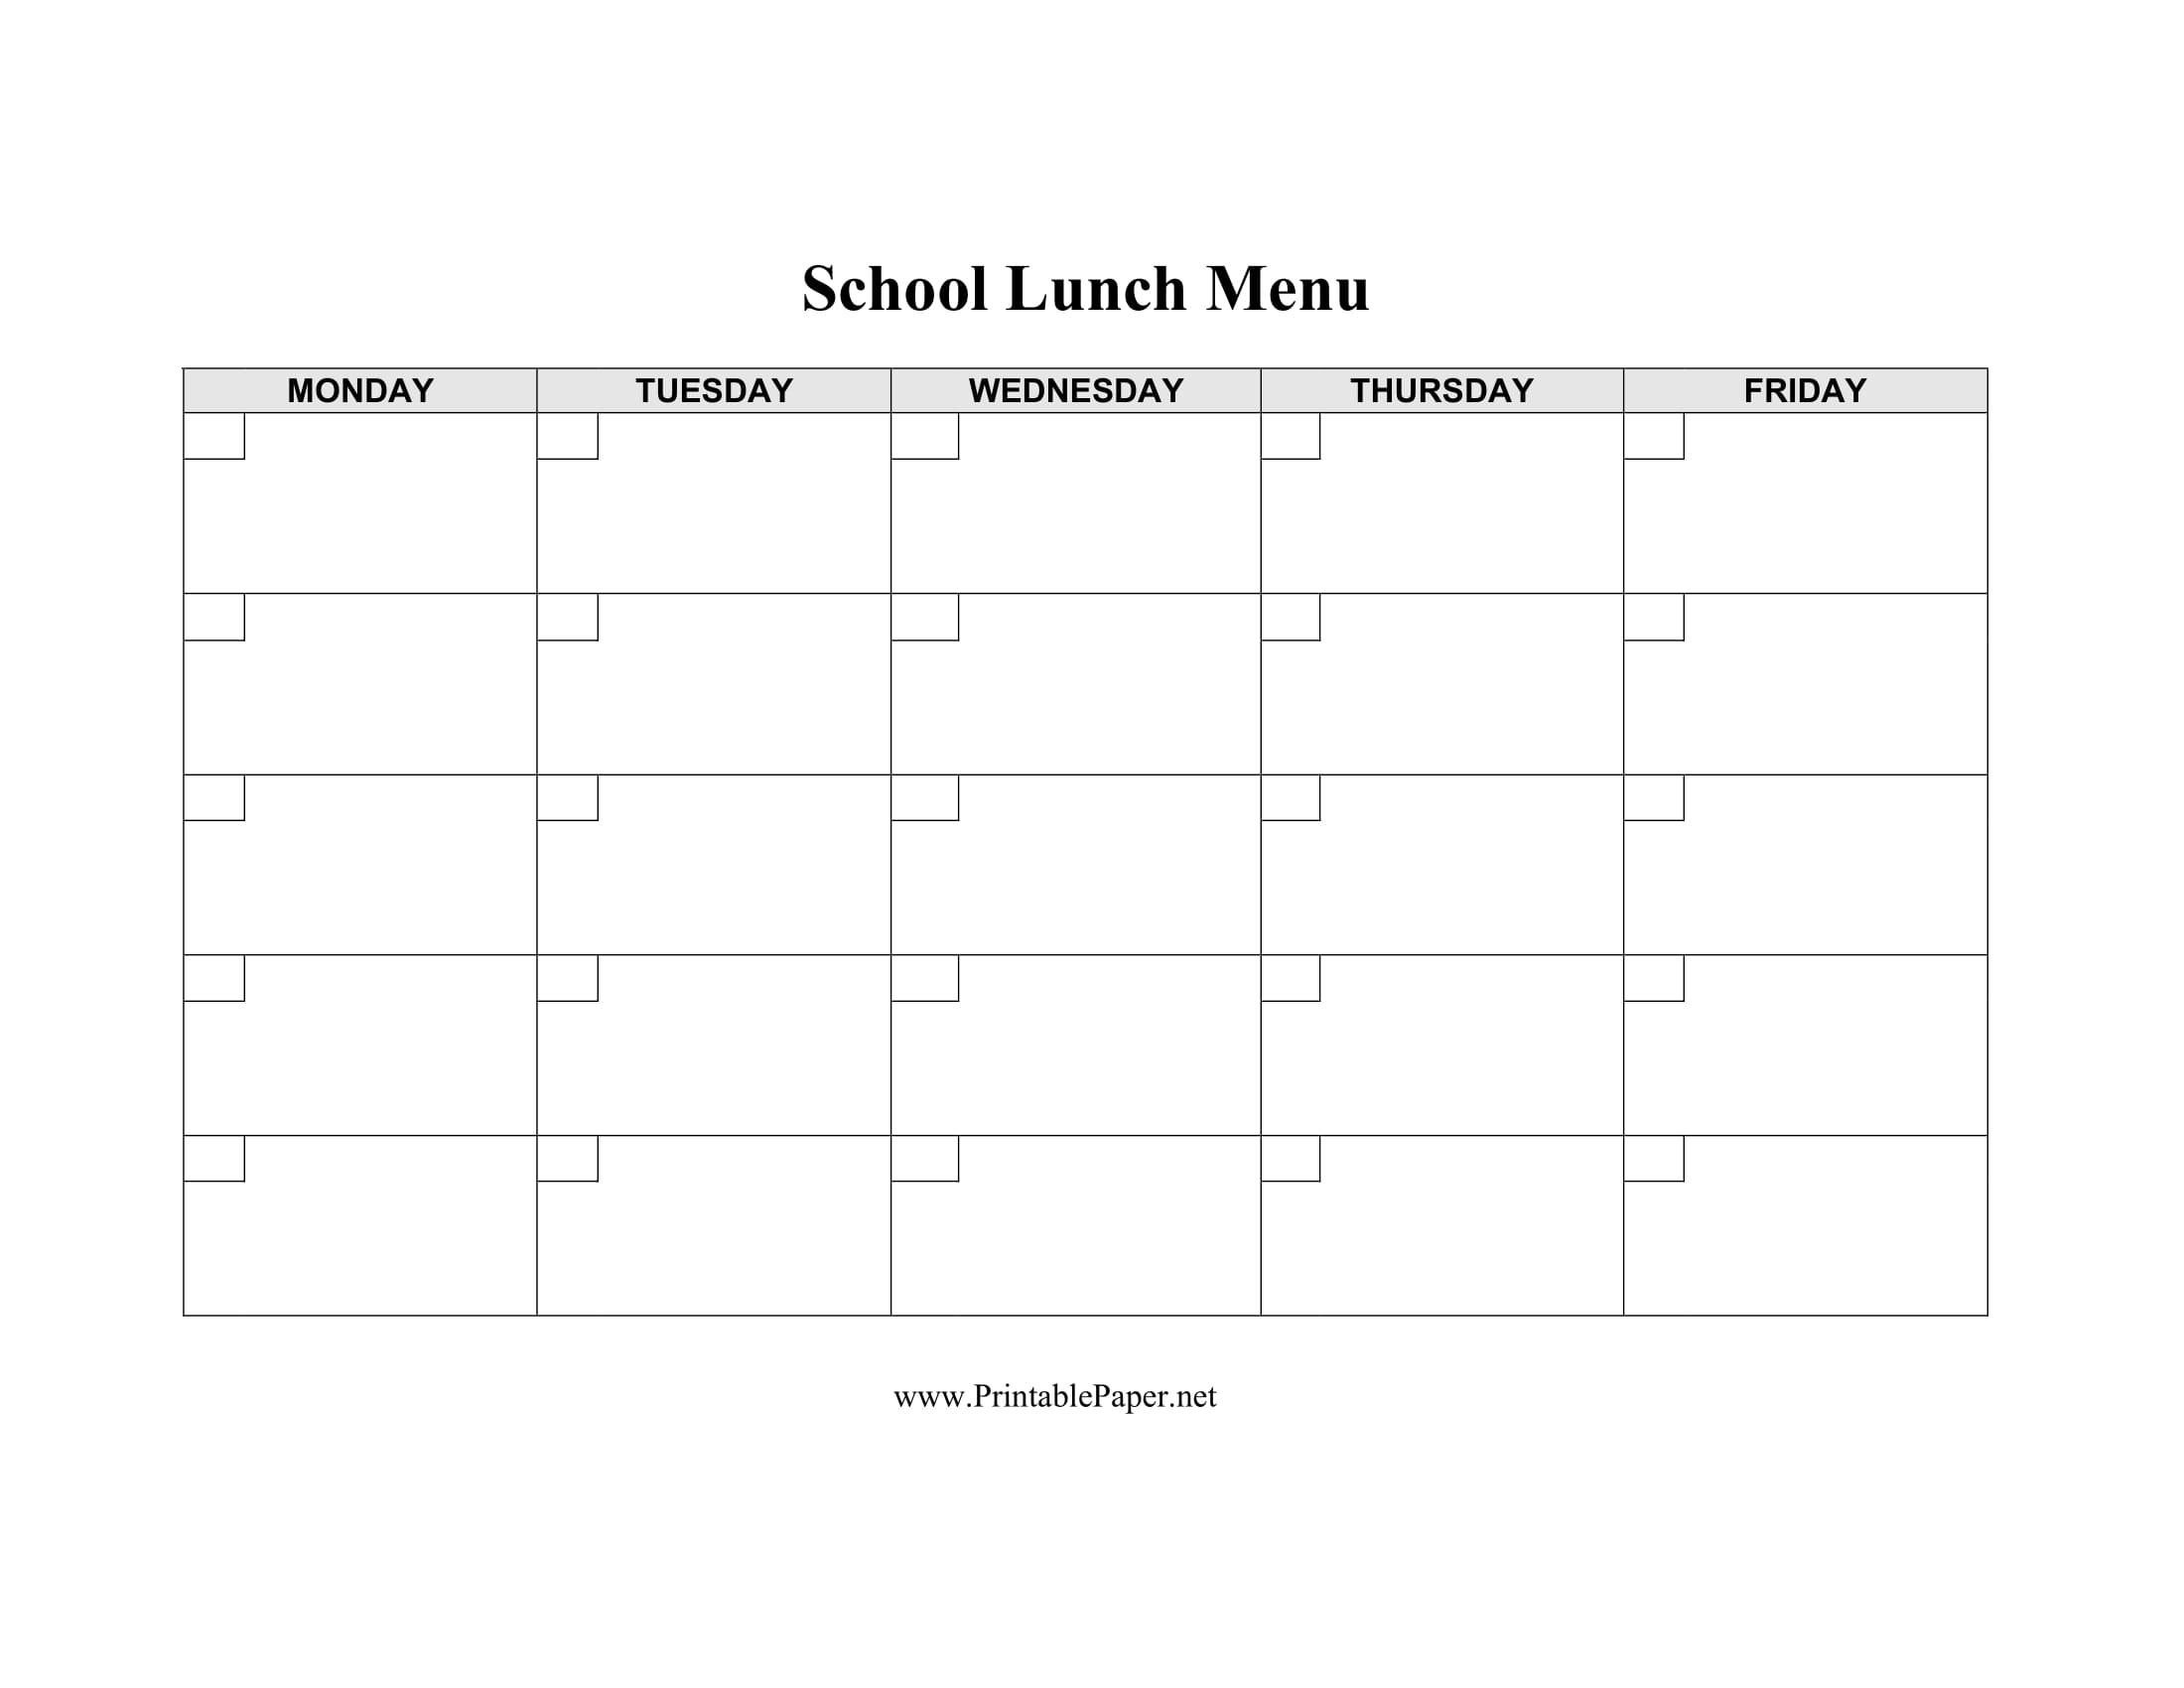 blank school lunch menu template 1